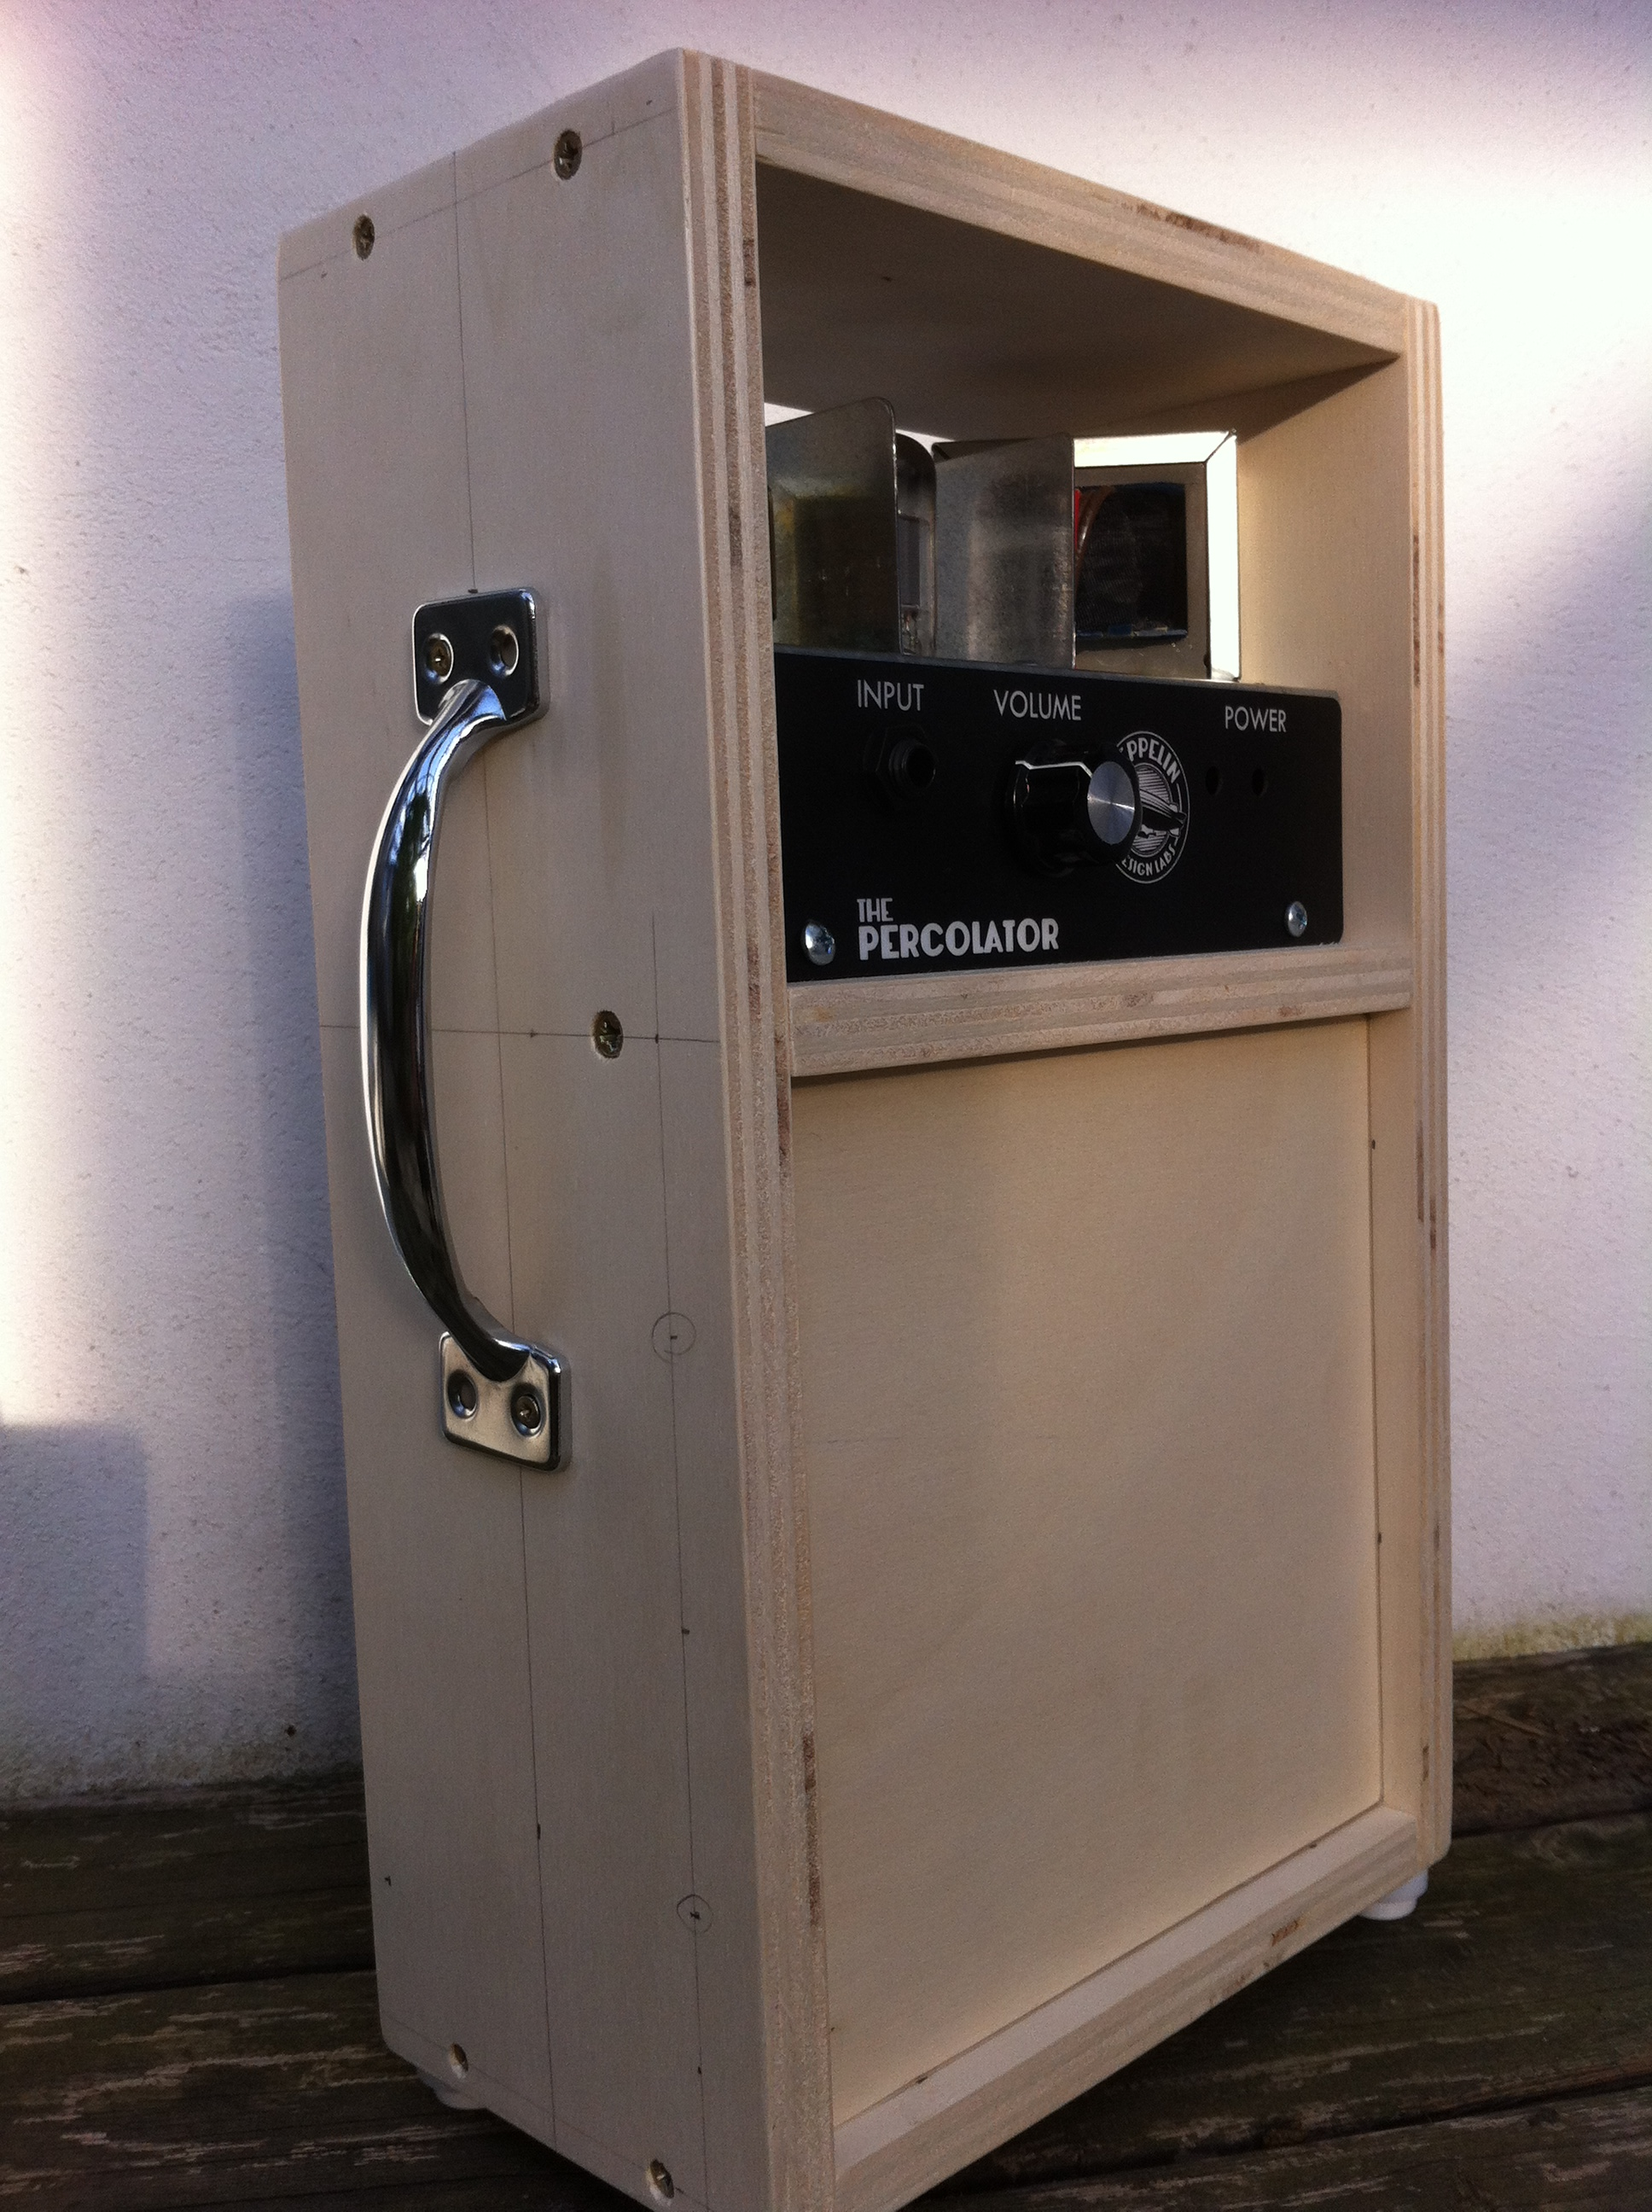 Percolator in custom cabinet